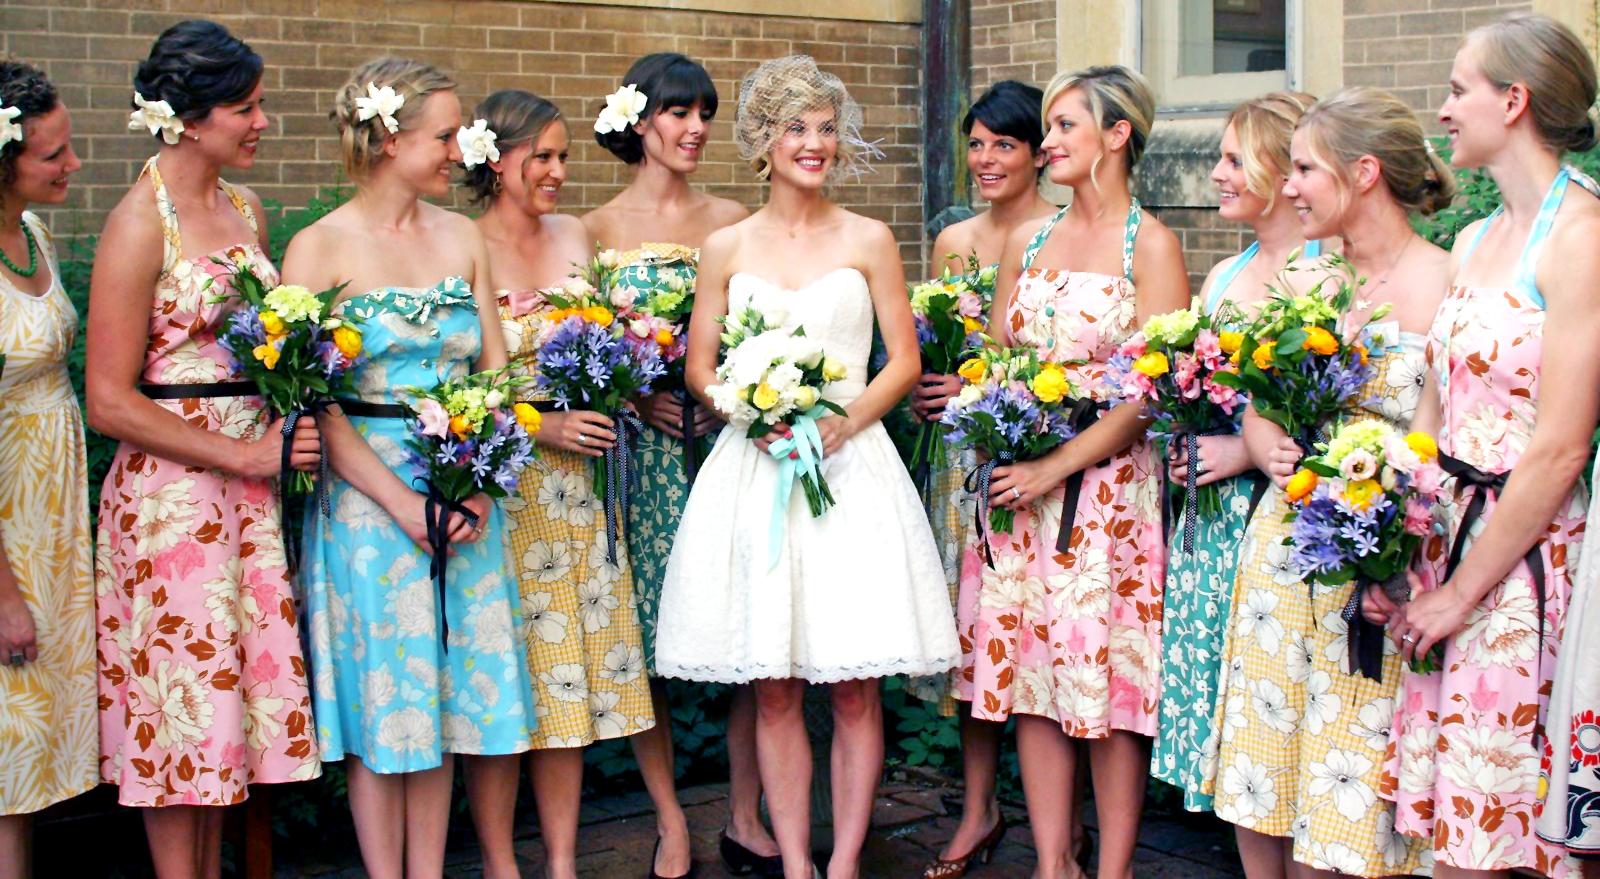 Resultados de la bsqueda de imgenes de google de http1bp resultados de la bsqueda de imgenes de google de http1bpspot orhs84hv0tyubi houskuiaaaaaaaabbob8rap5mfki0s1600 bridesmaid dress ombrellifo Choice Image